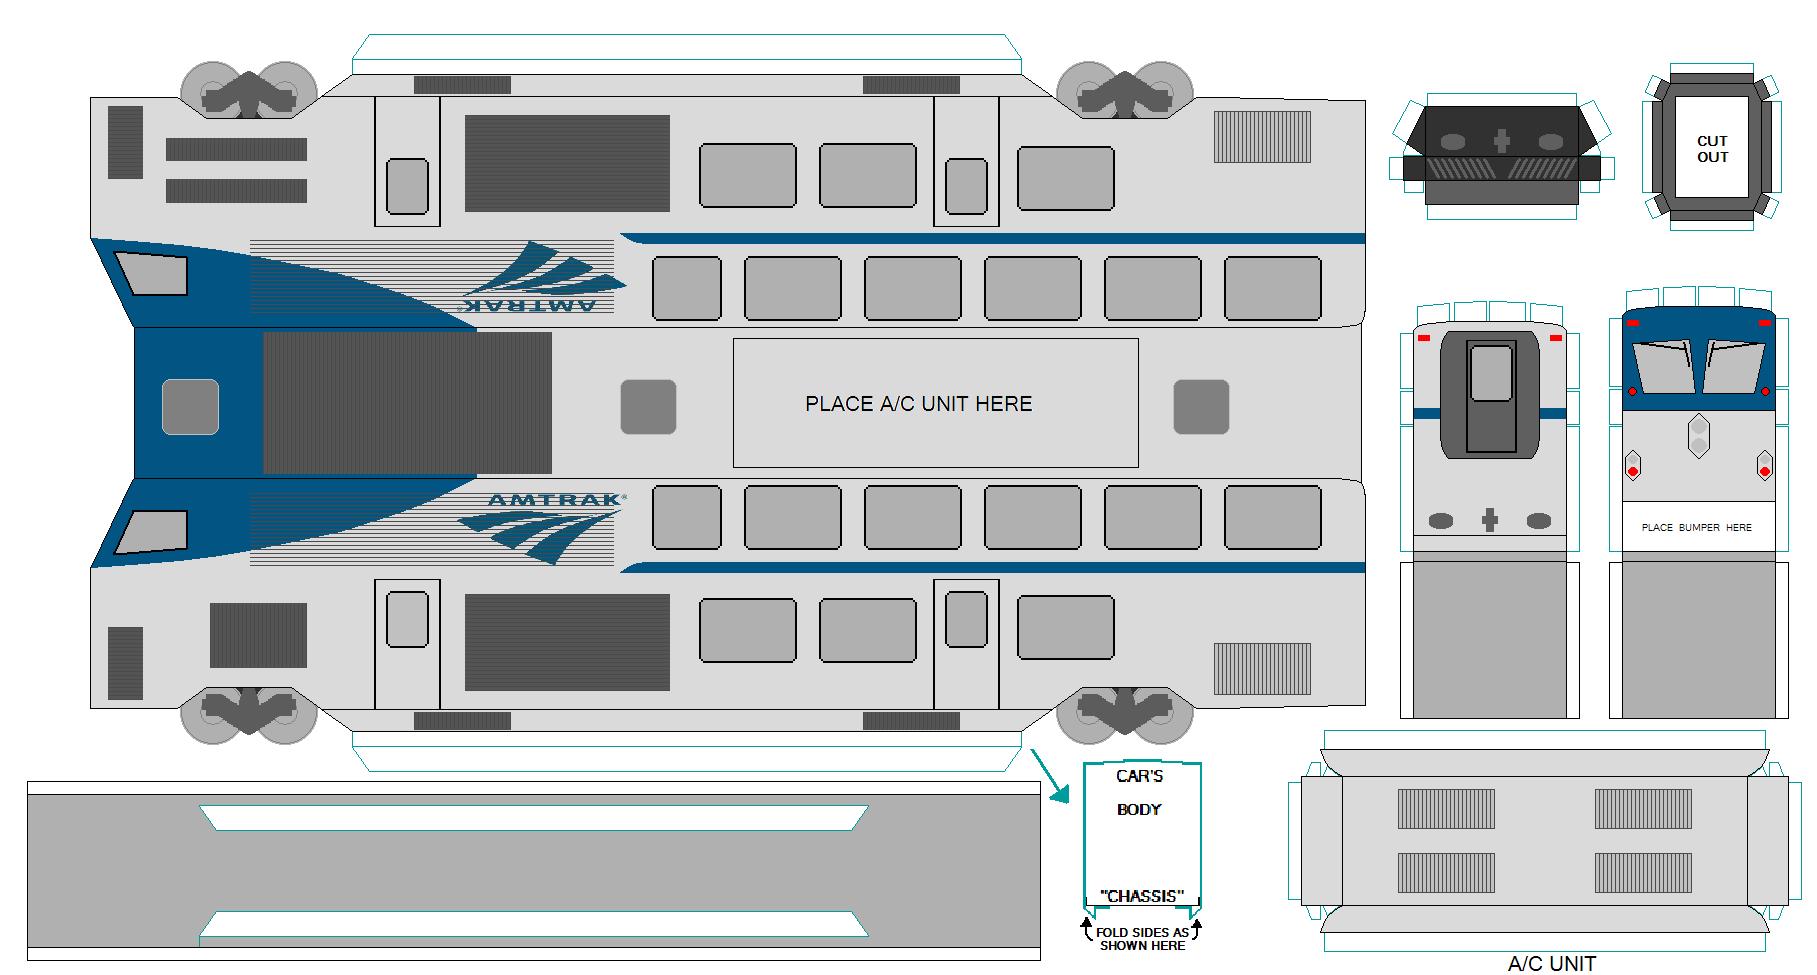 Amtrak_Power_car_bi_level.PNG